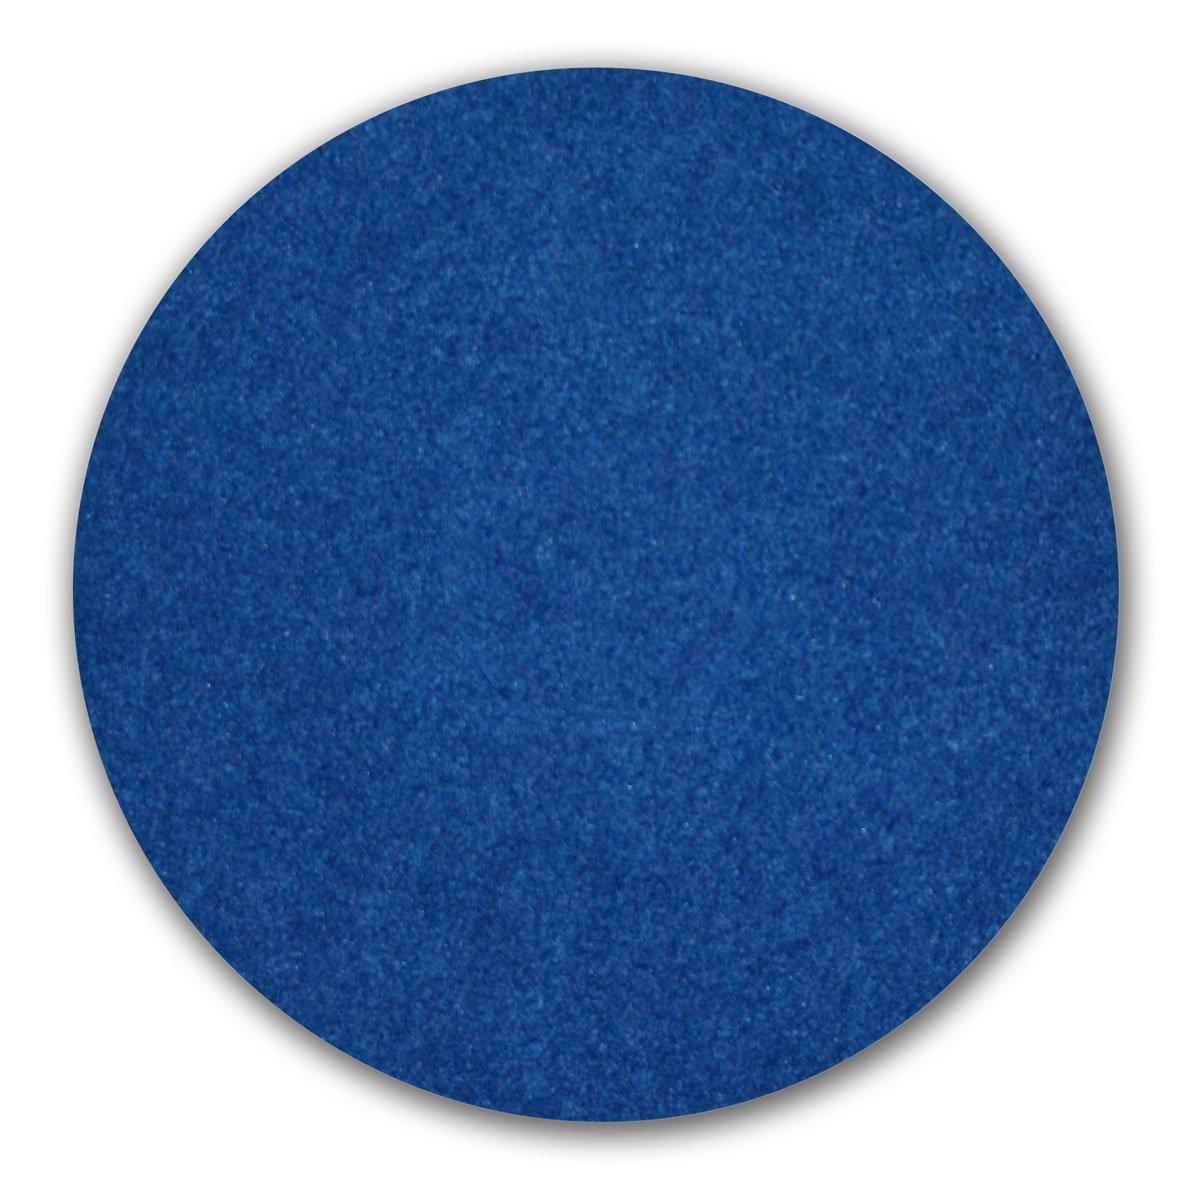 Orbiter Blue Scrub Pad1